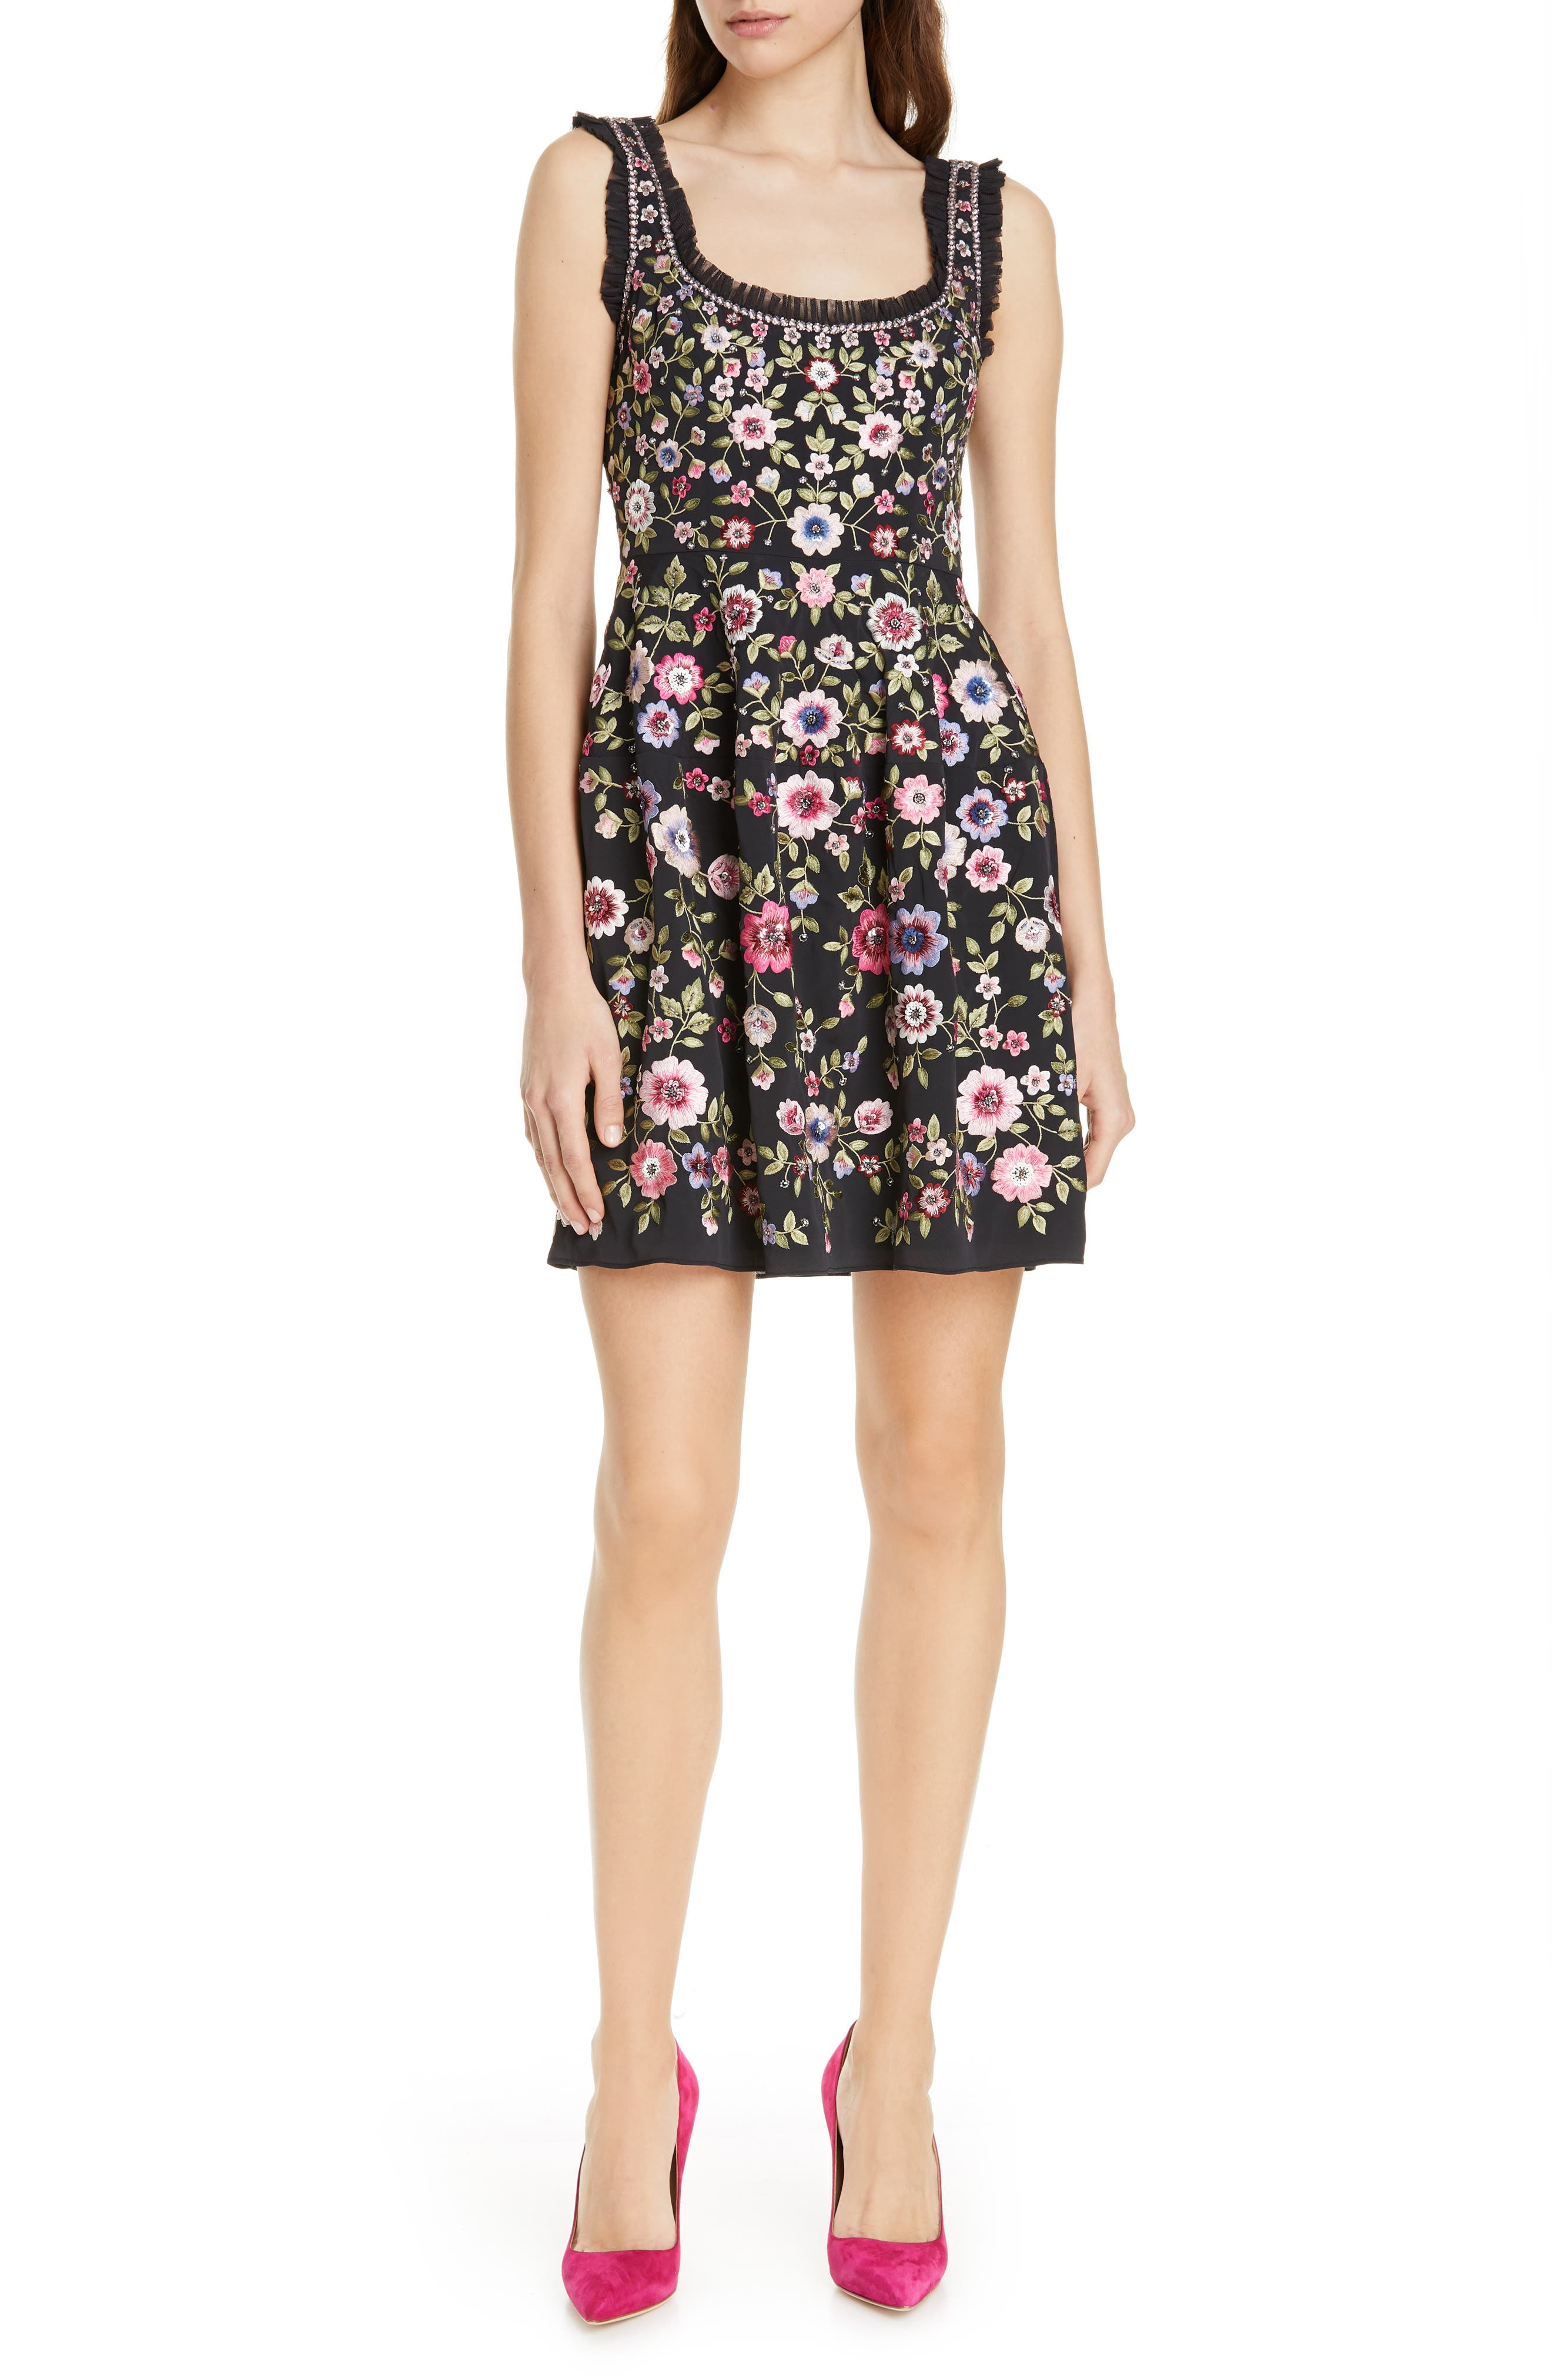 Needle & Thread Floral Romance Minidress, Black